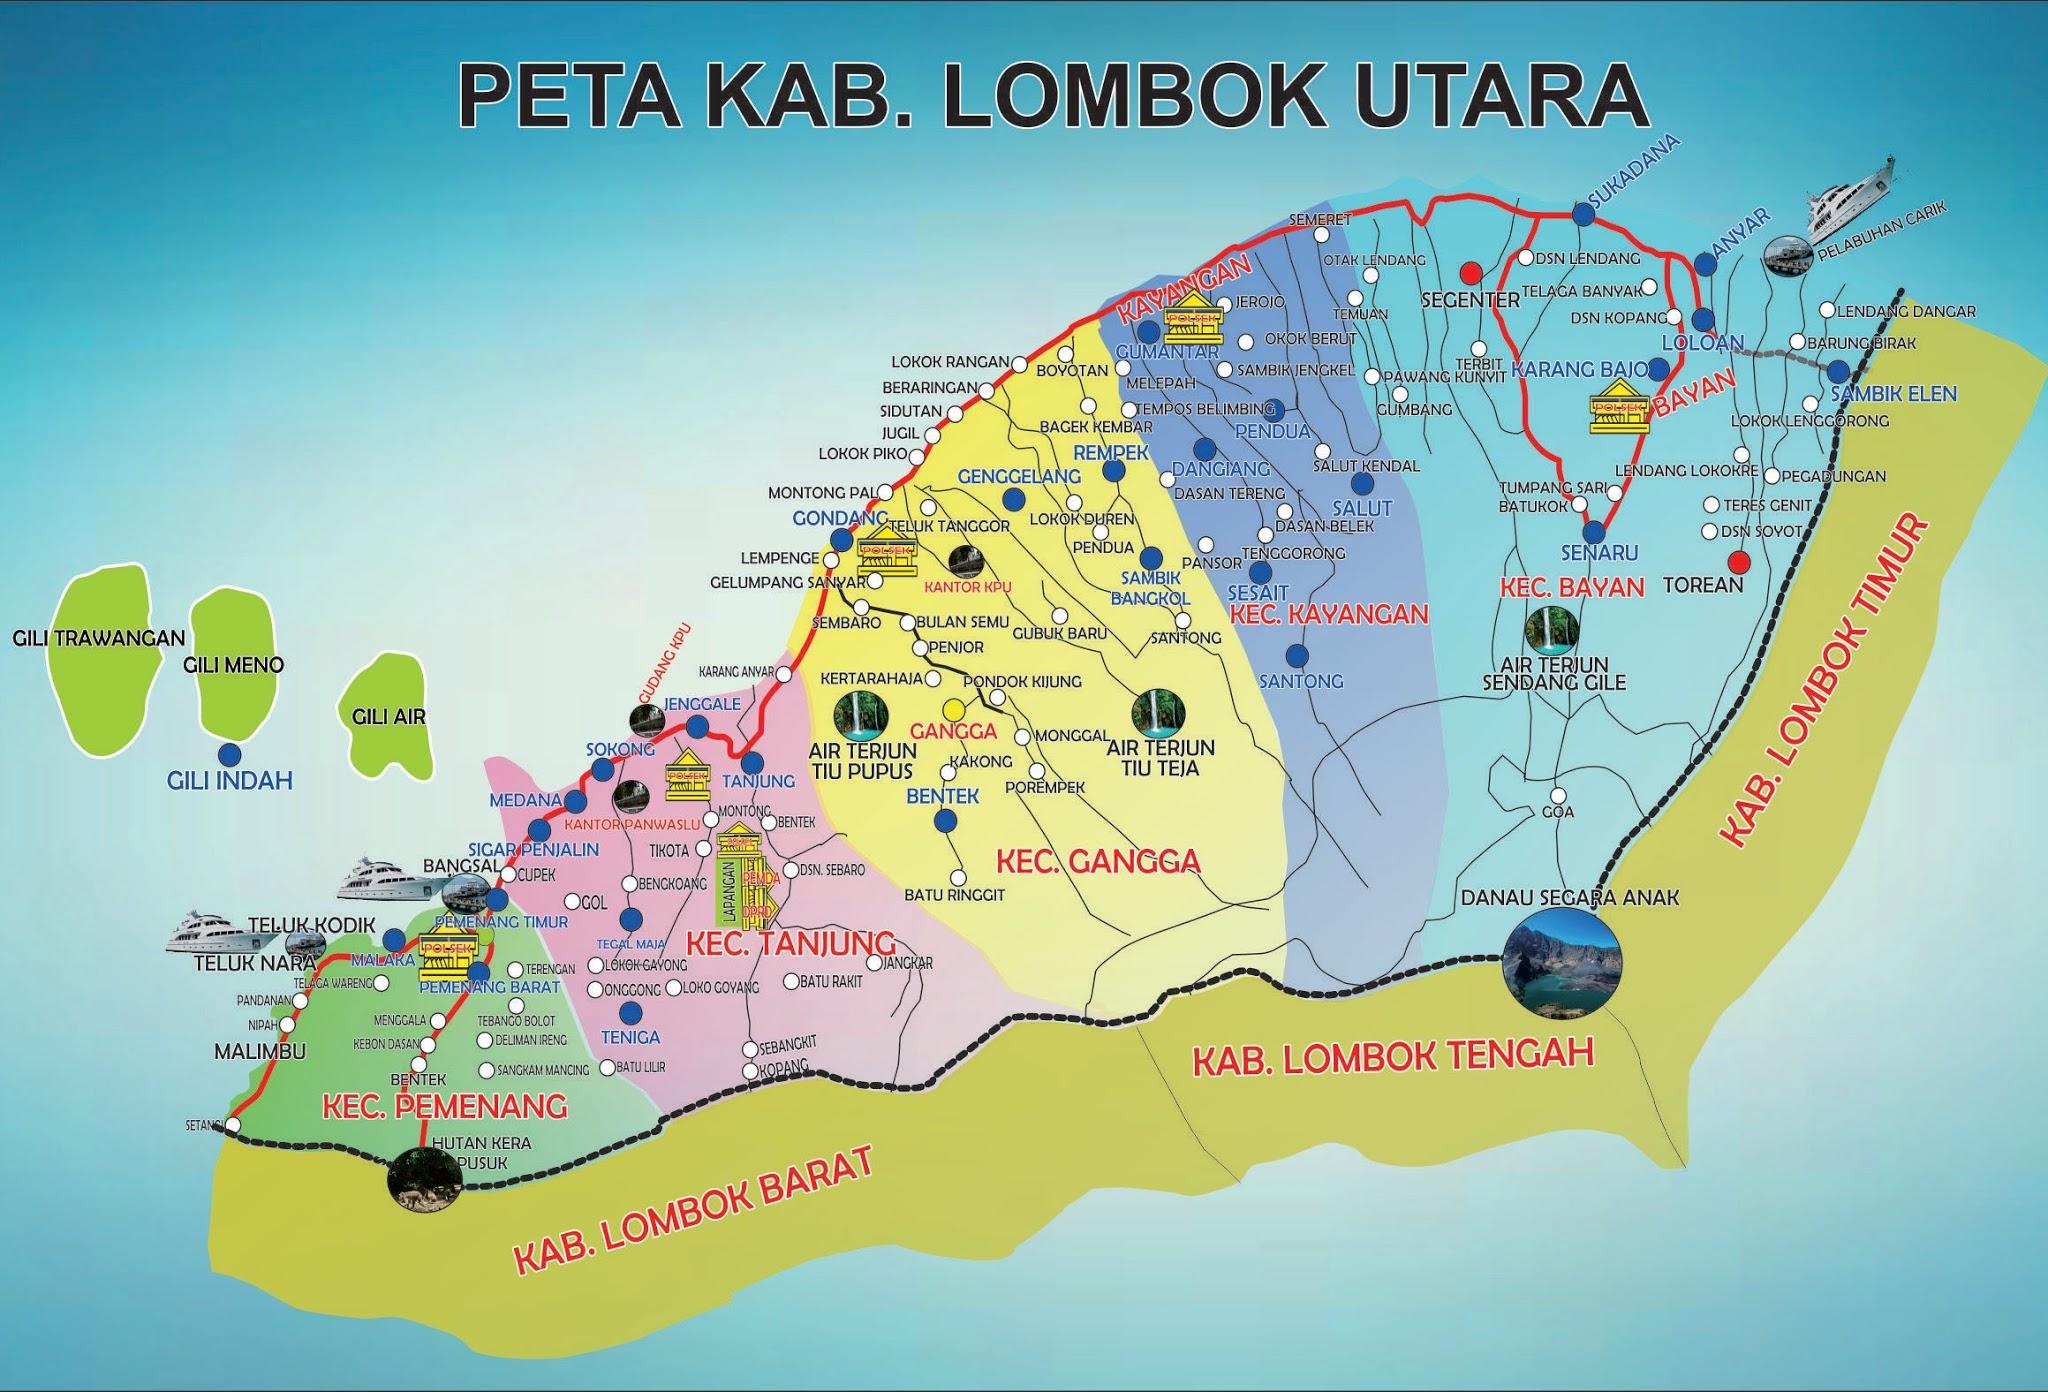 Peta Kota Kabupaten Lombok Utara Klu Pulau Gili Air Kab